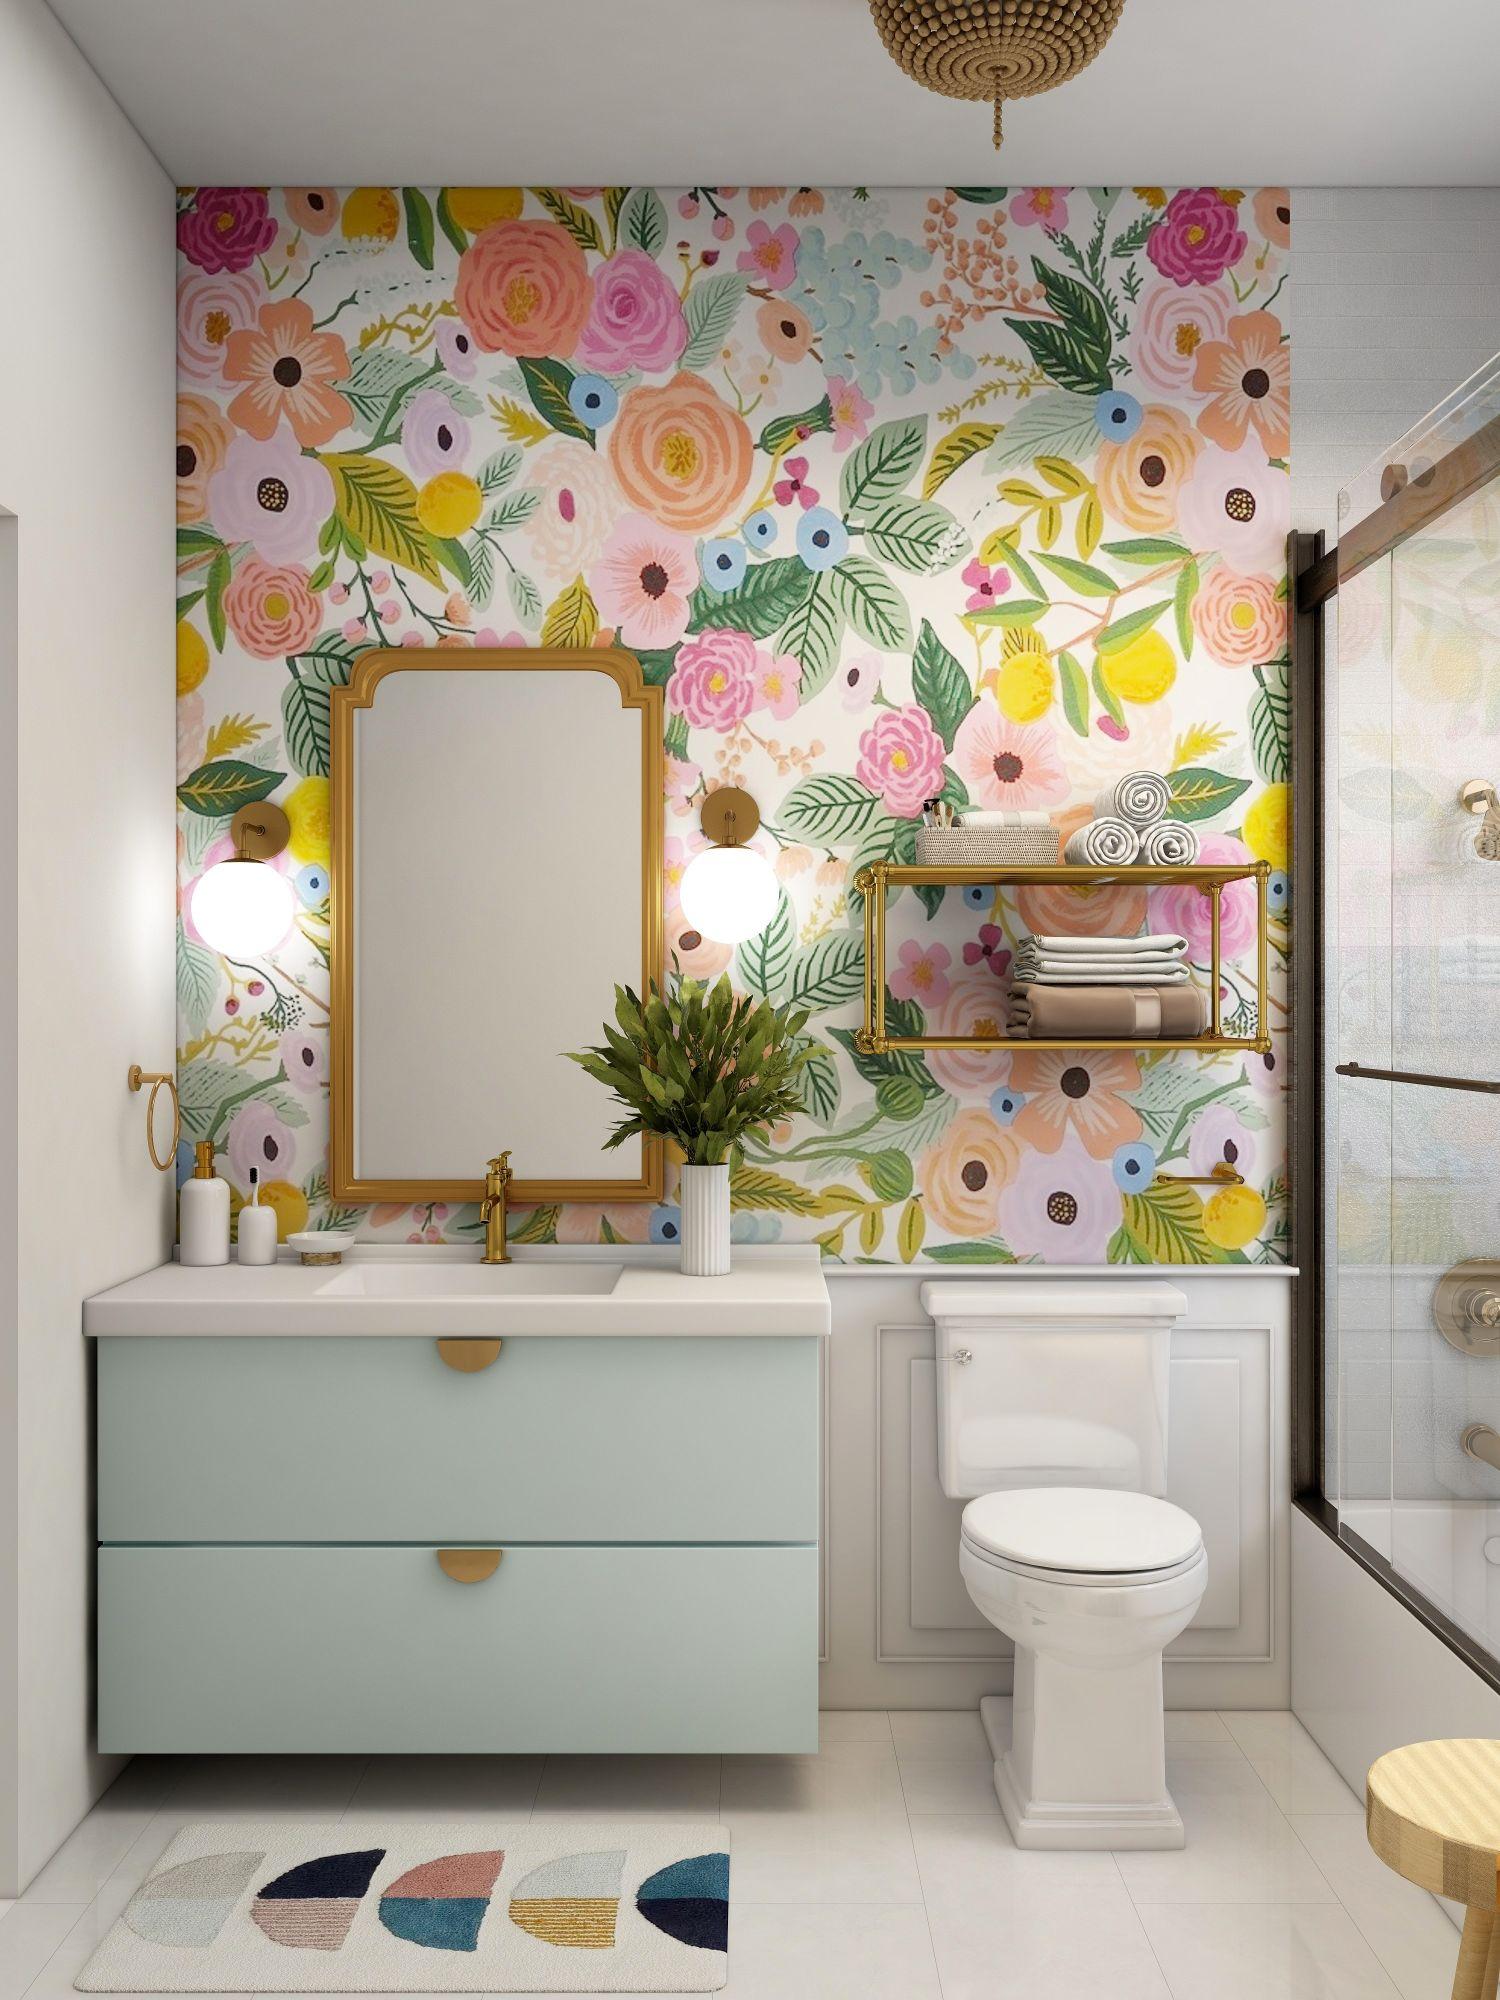 Carta da parati floreale in bagno